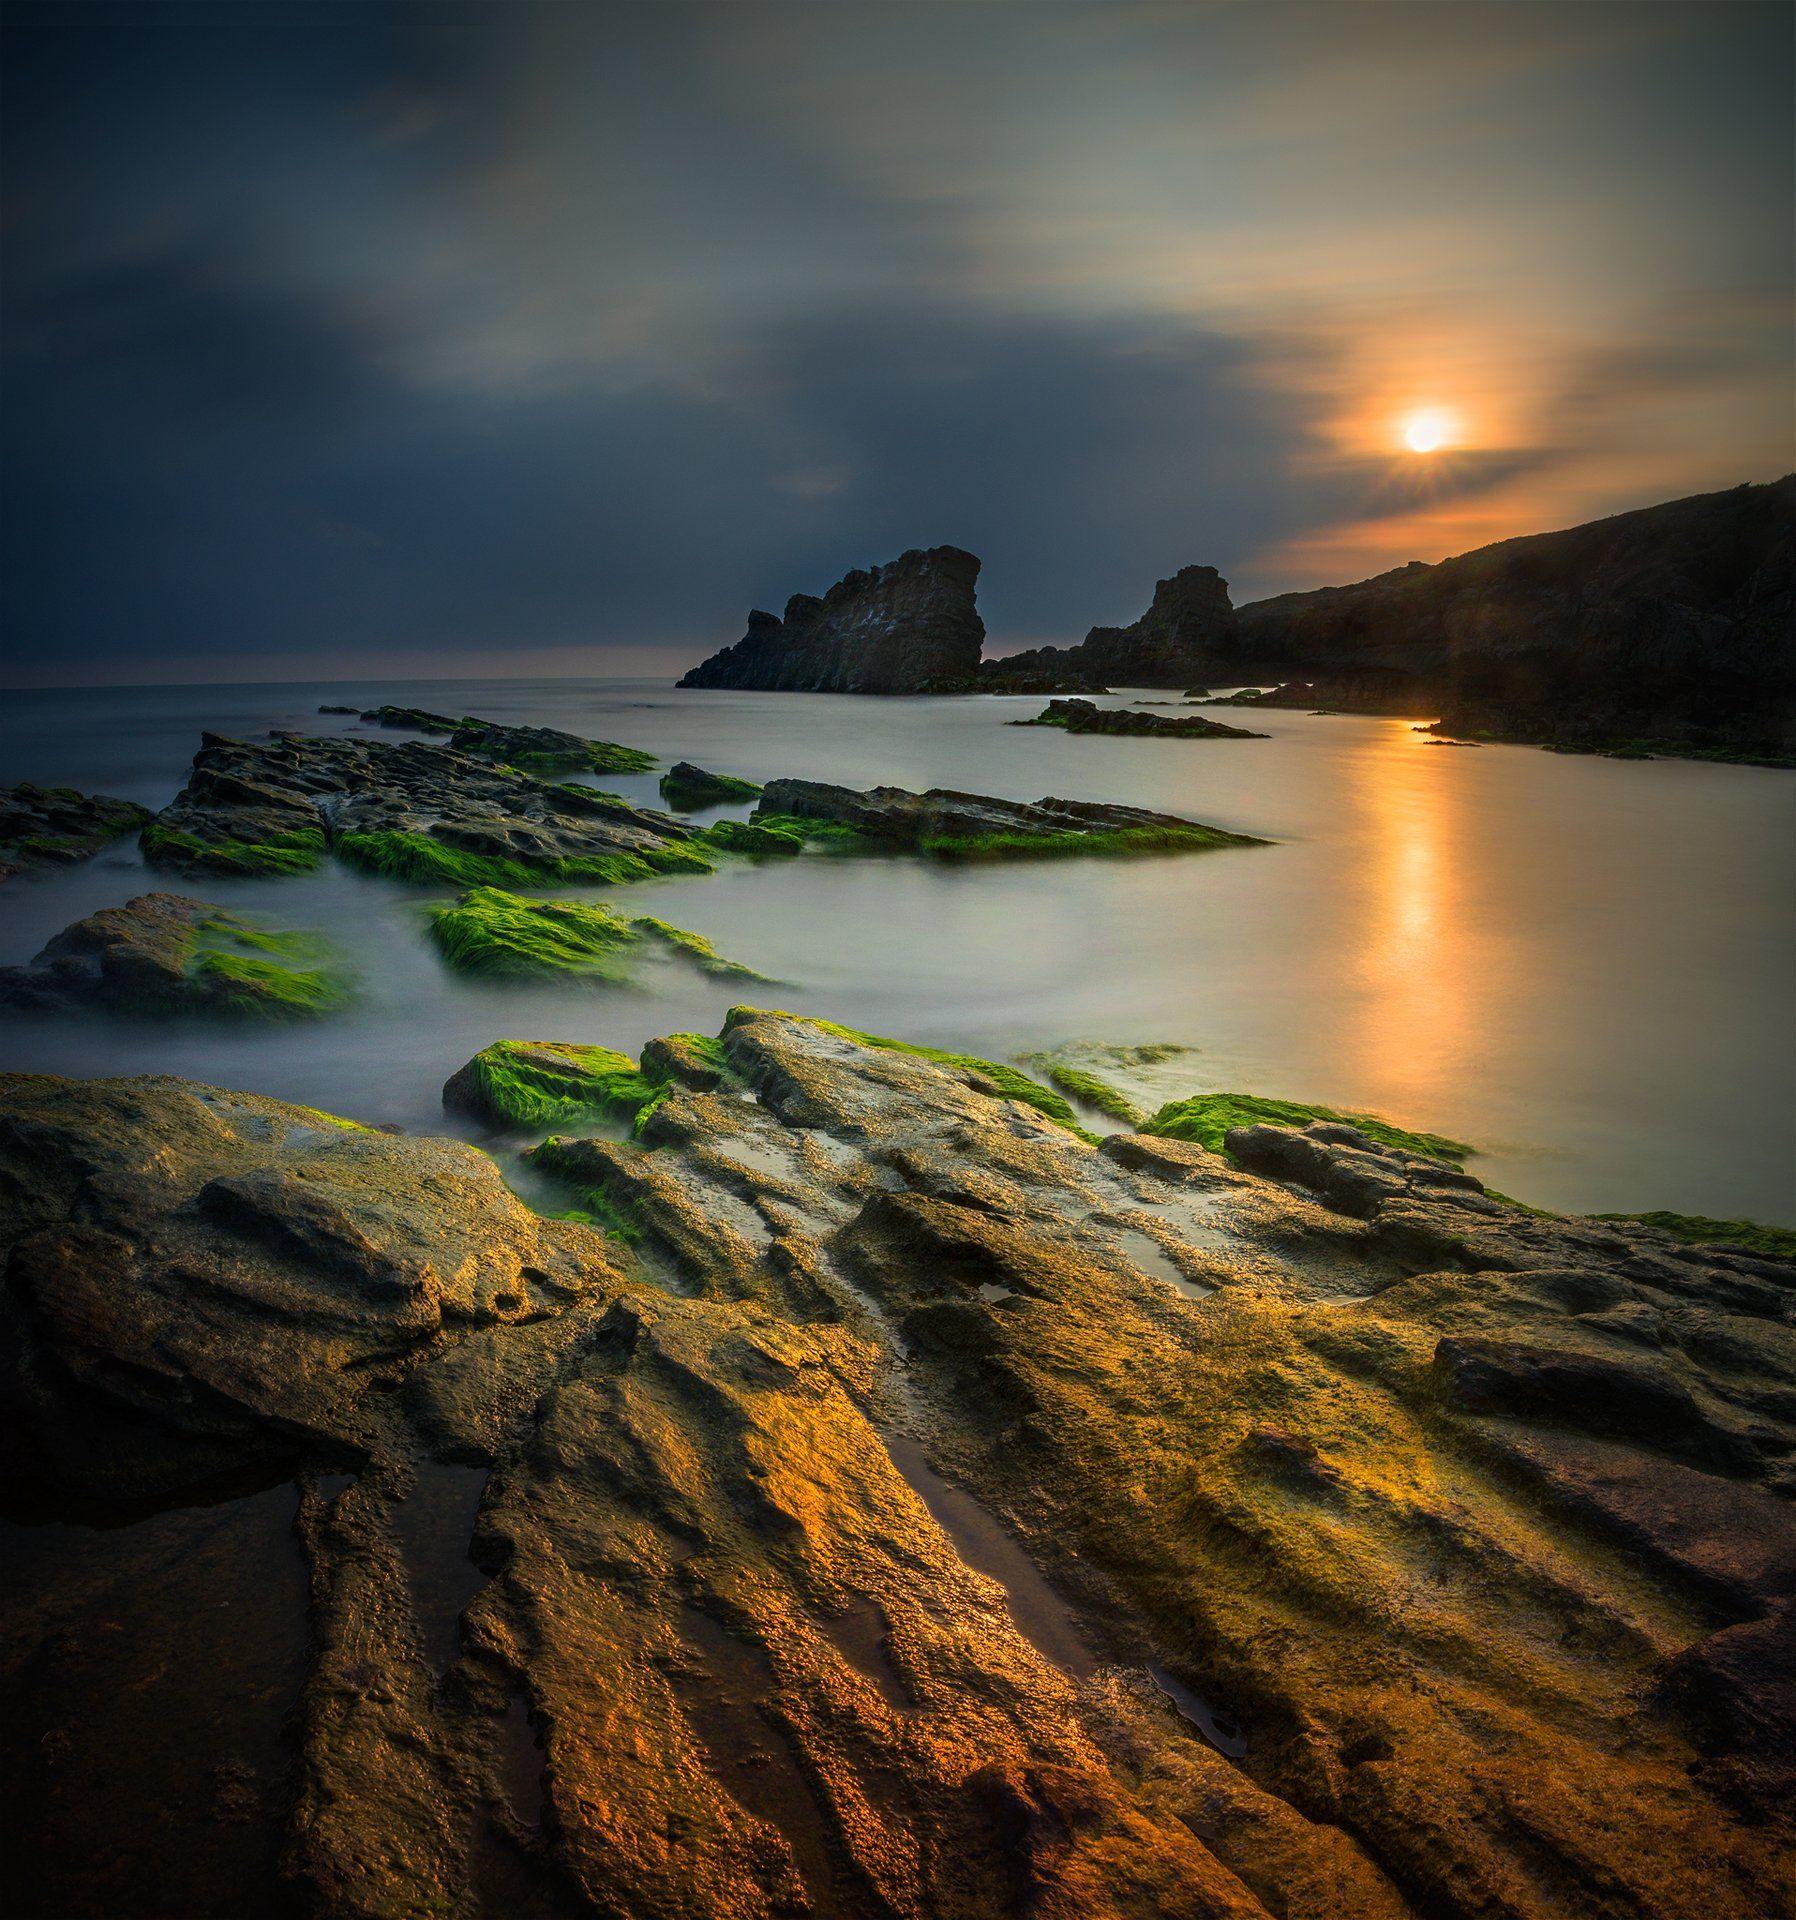 landscape, nature, seascape, sunrise, morning, rocks, coastal, coast, beach, lake, long, exposure, scenery, reflections, vibrant, Александър Александров